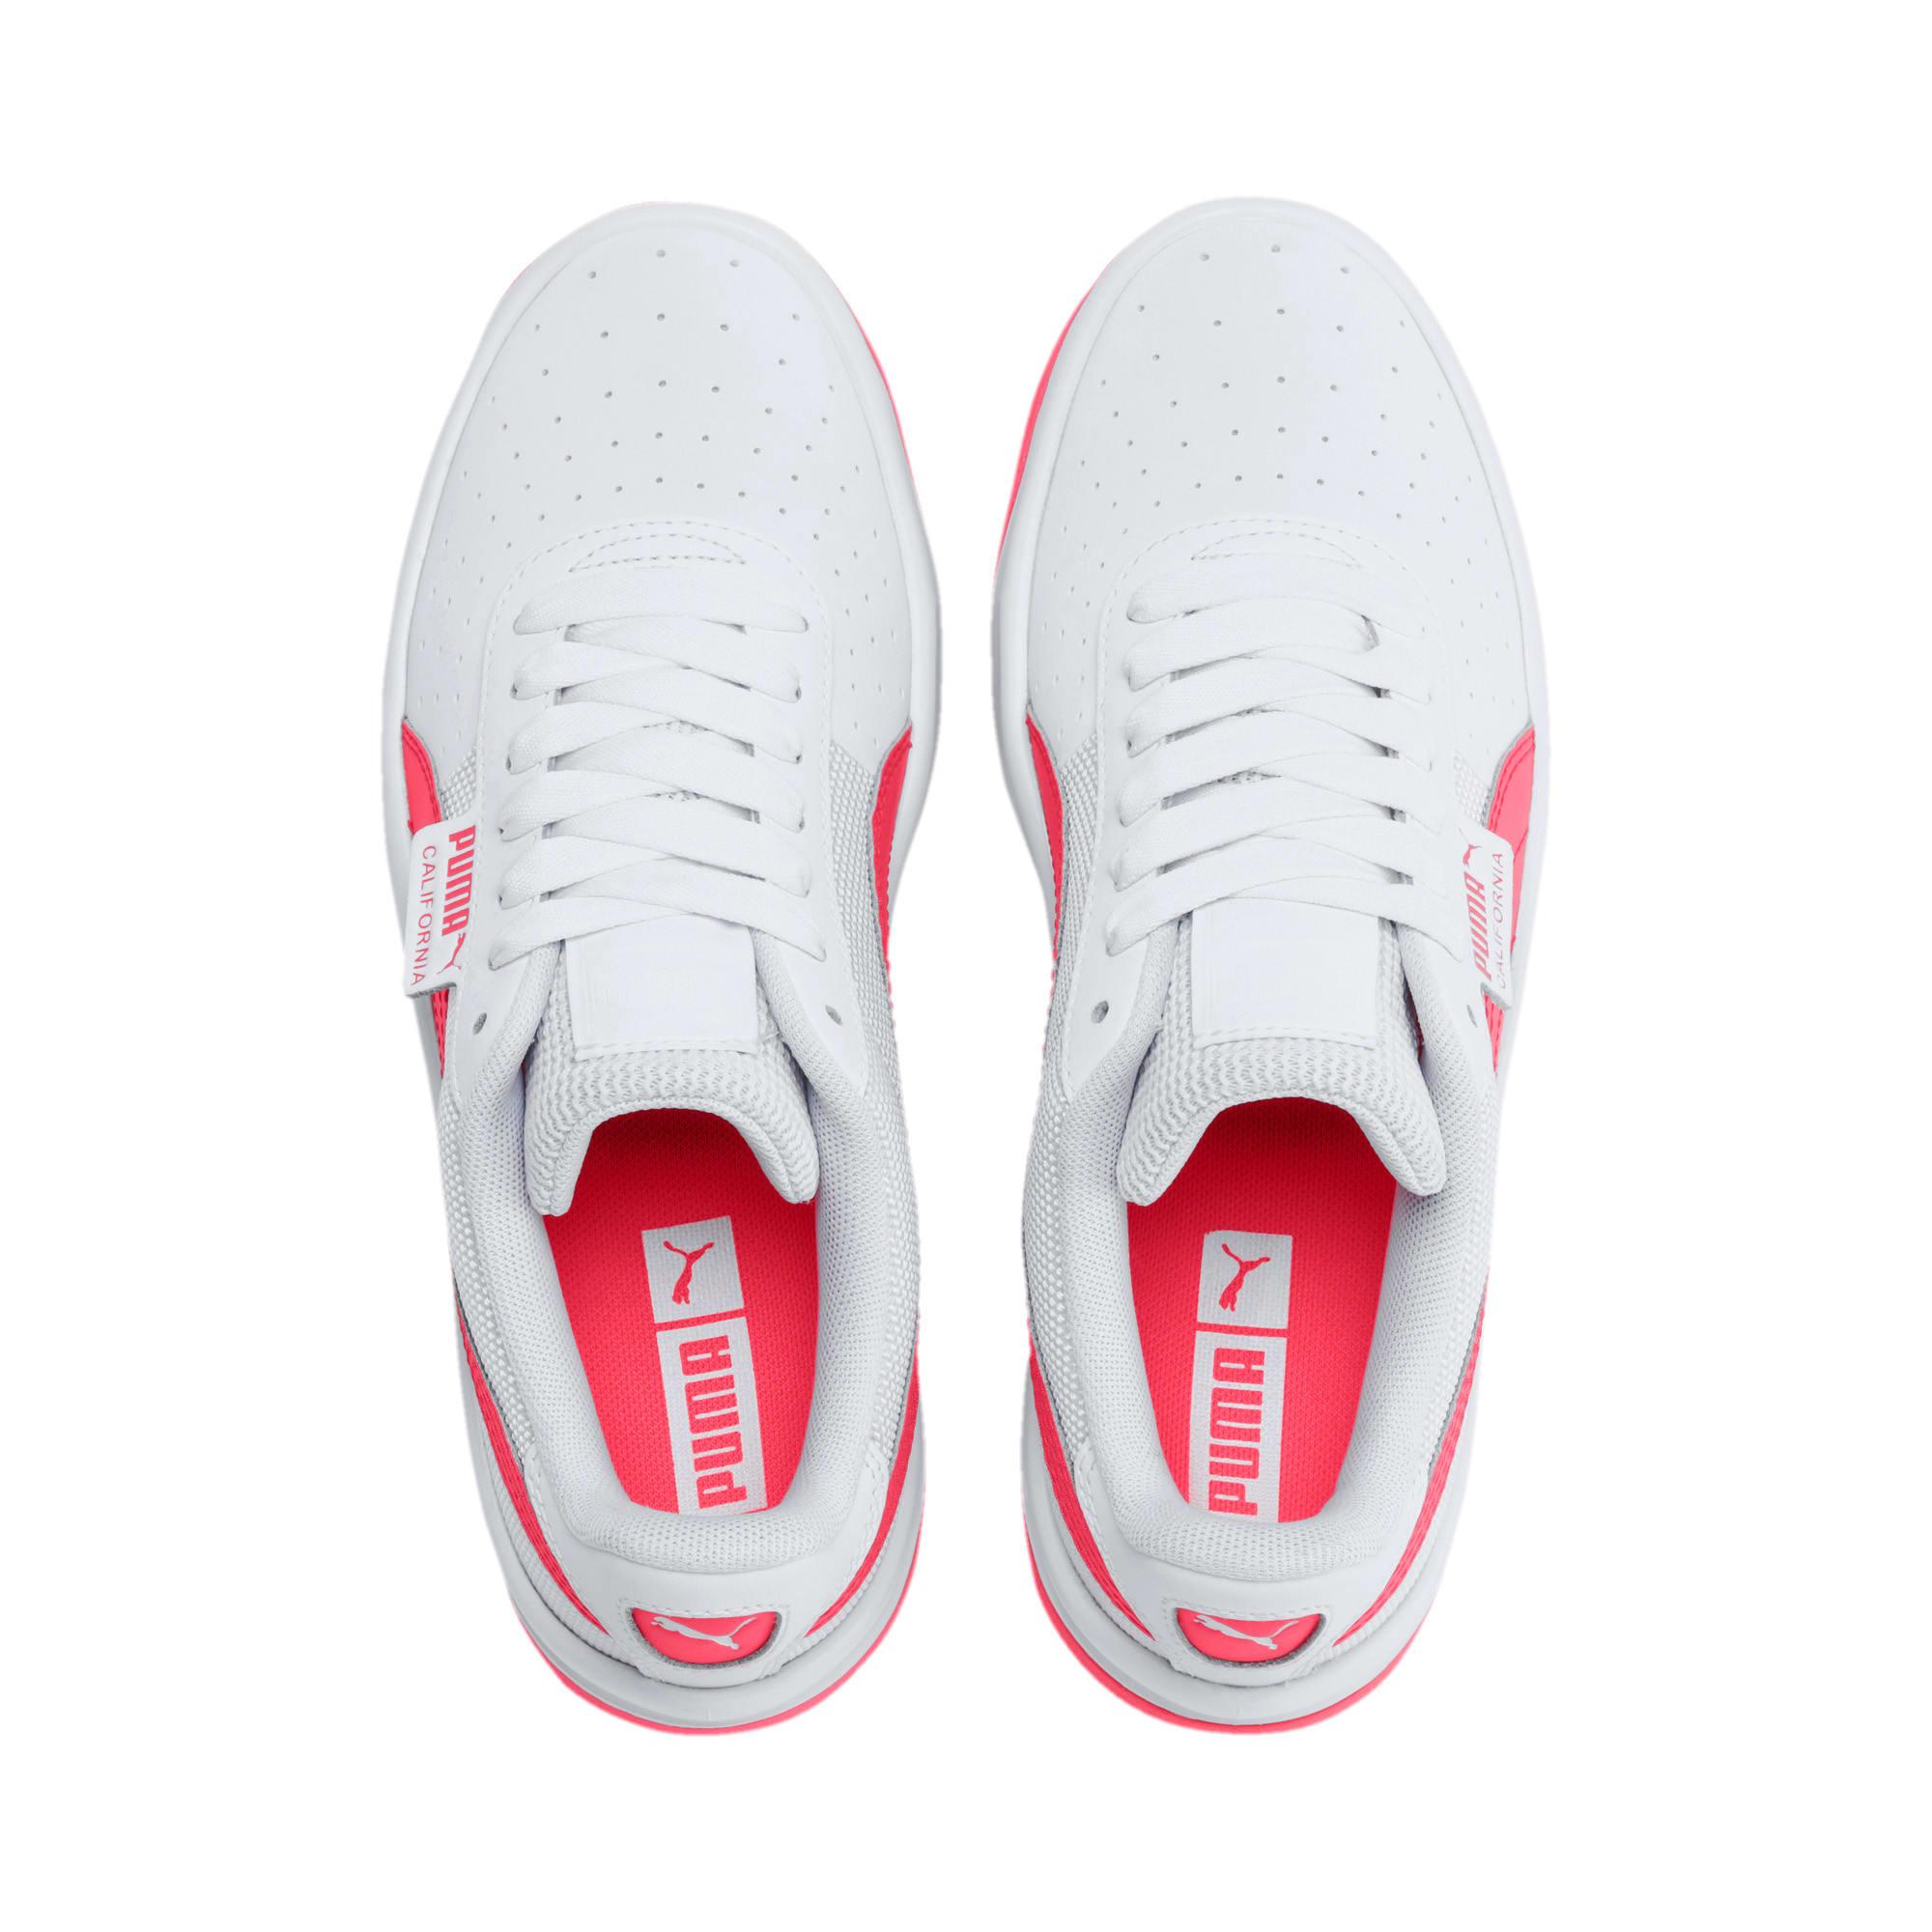 Thumbnail 6 of California Sneakers JR, Puma White-Pink Alert, medium